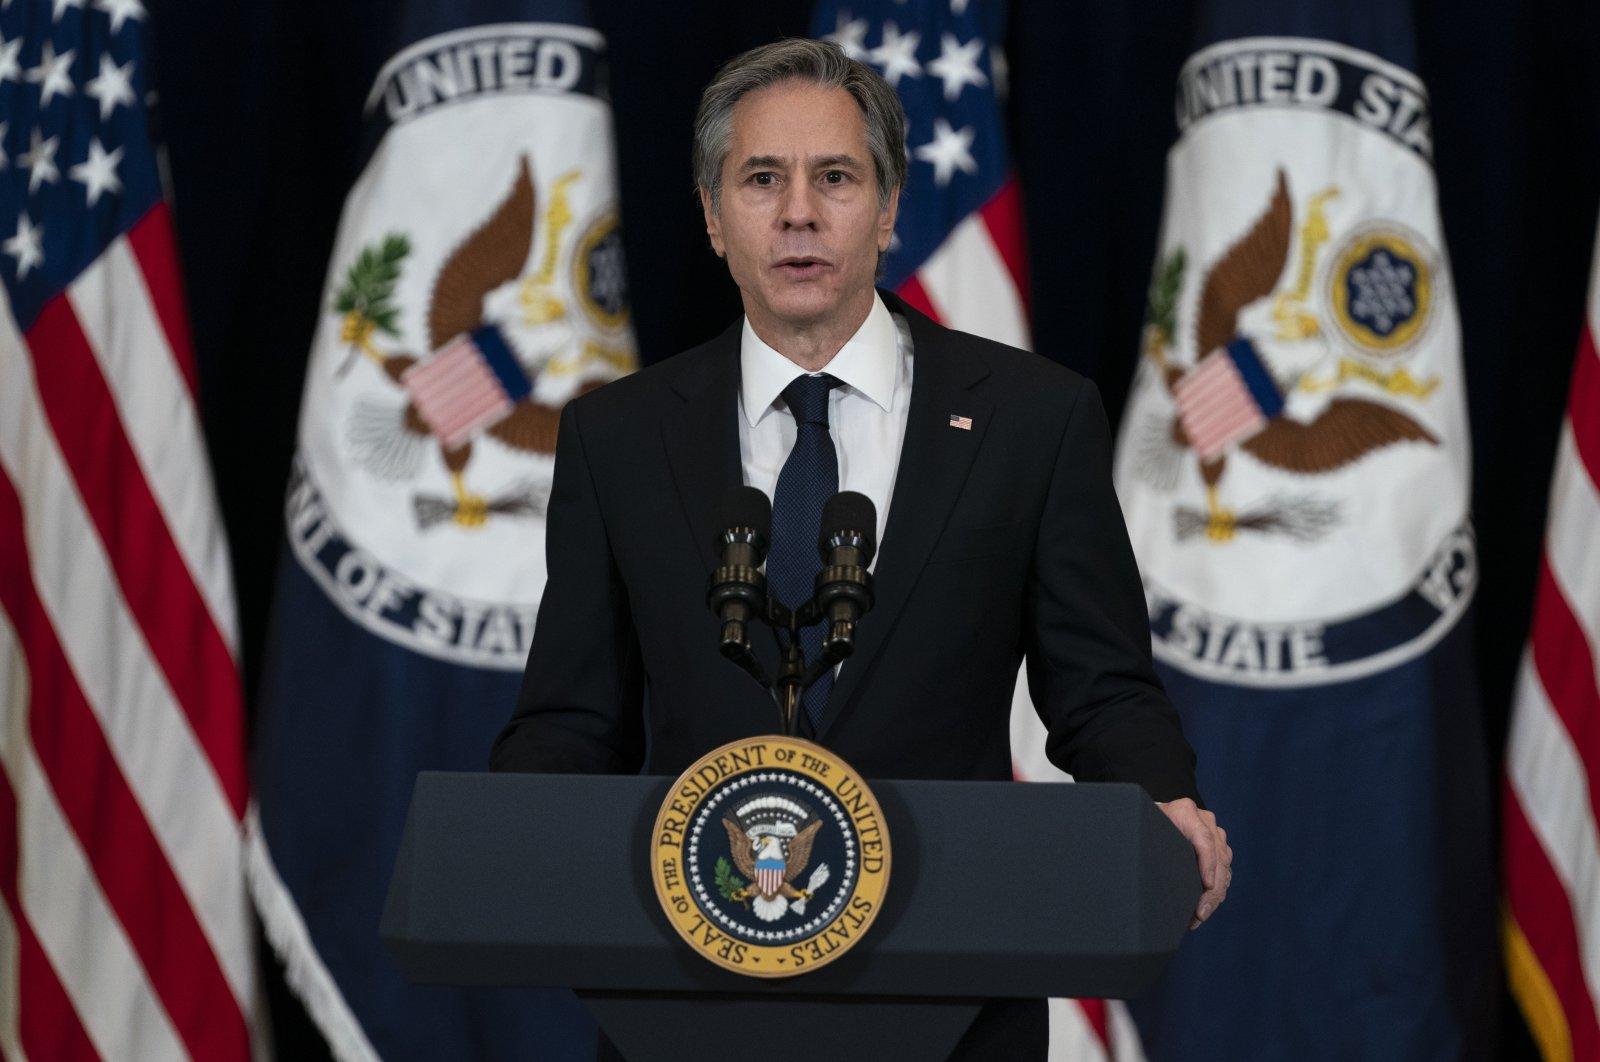 Secretary of State Antony Blinken speaks at the State Department in Washington on Feb. 4, 2021 (AP File Photo)